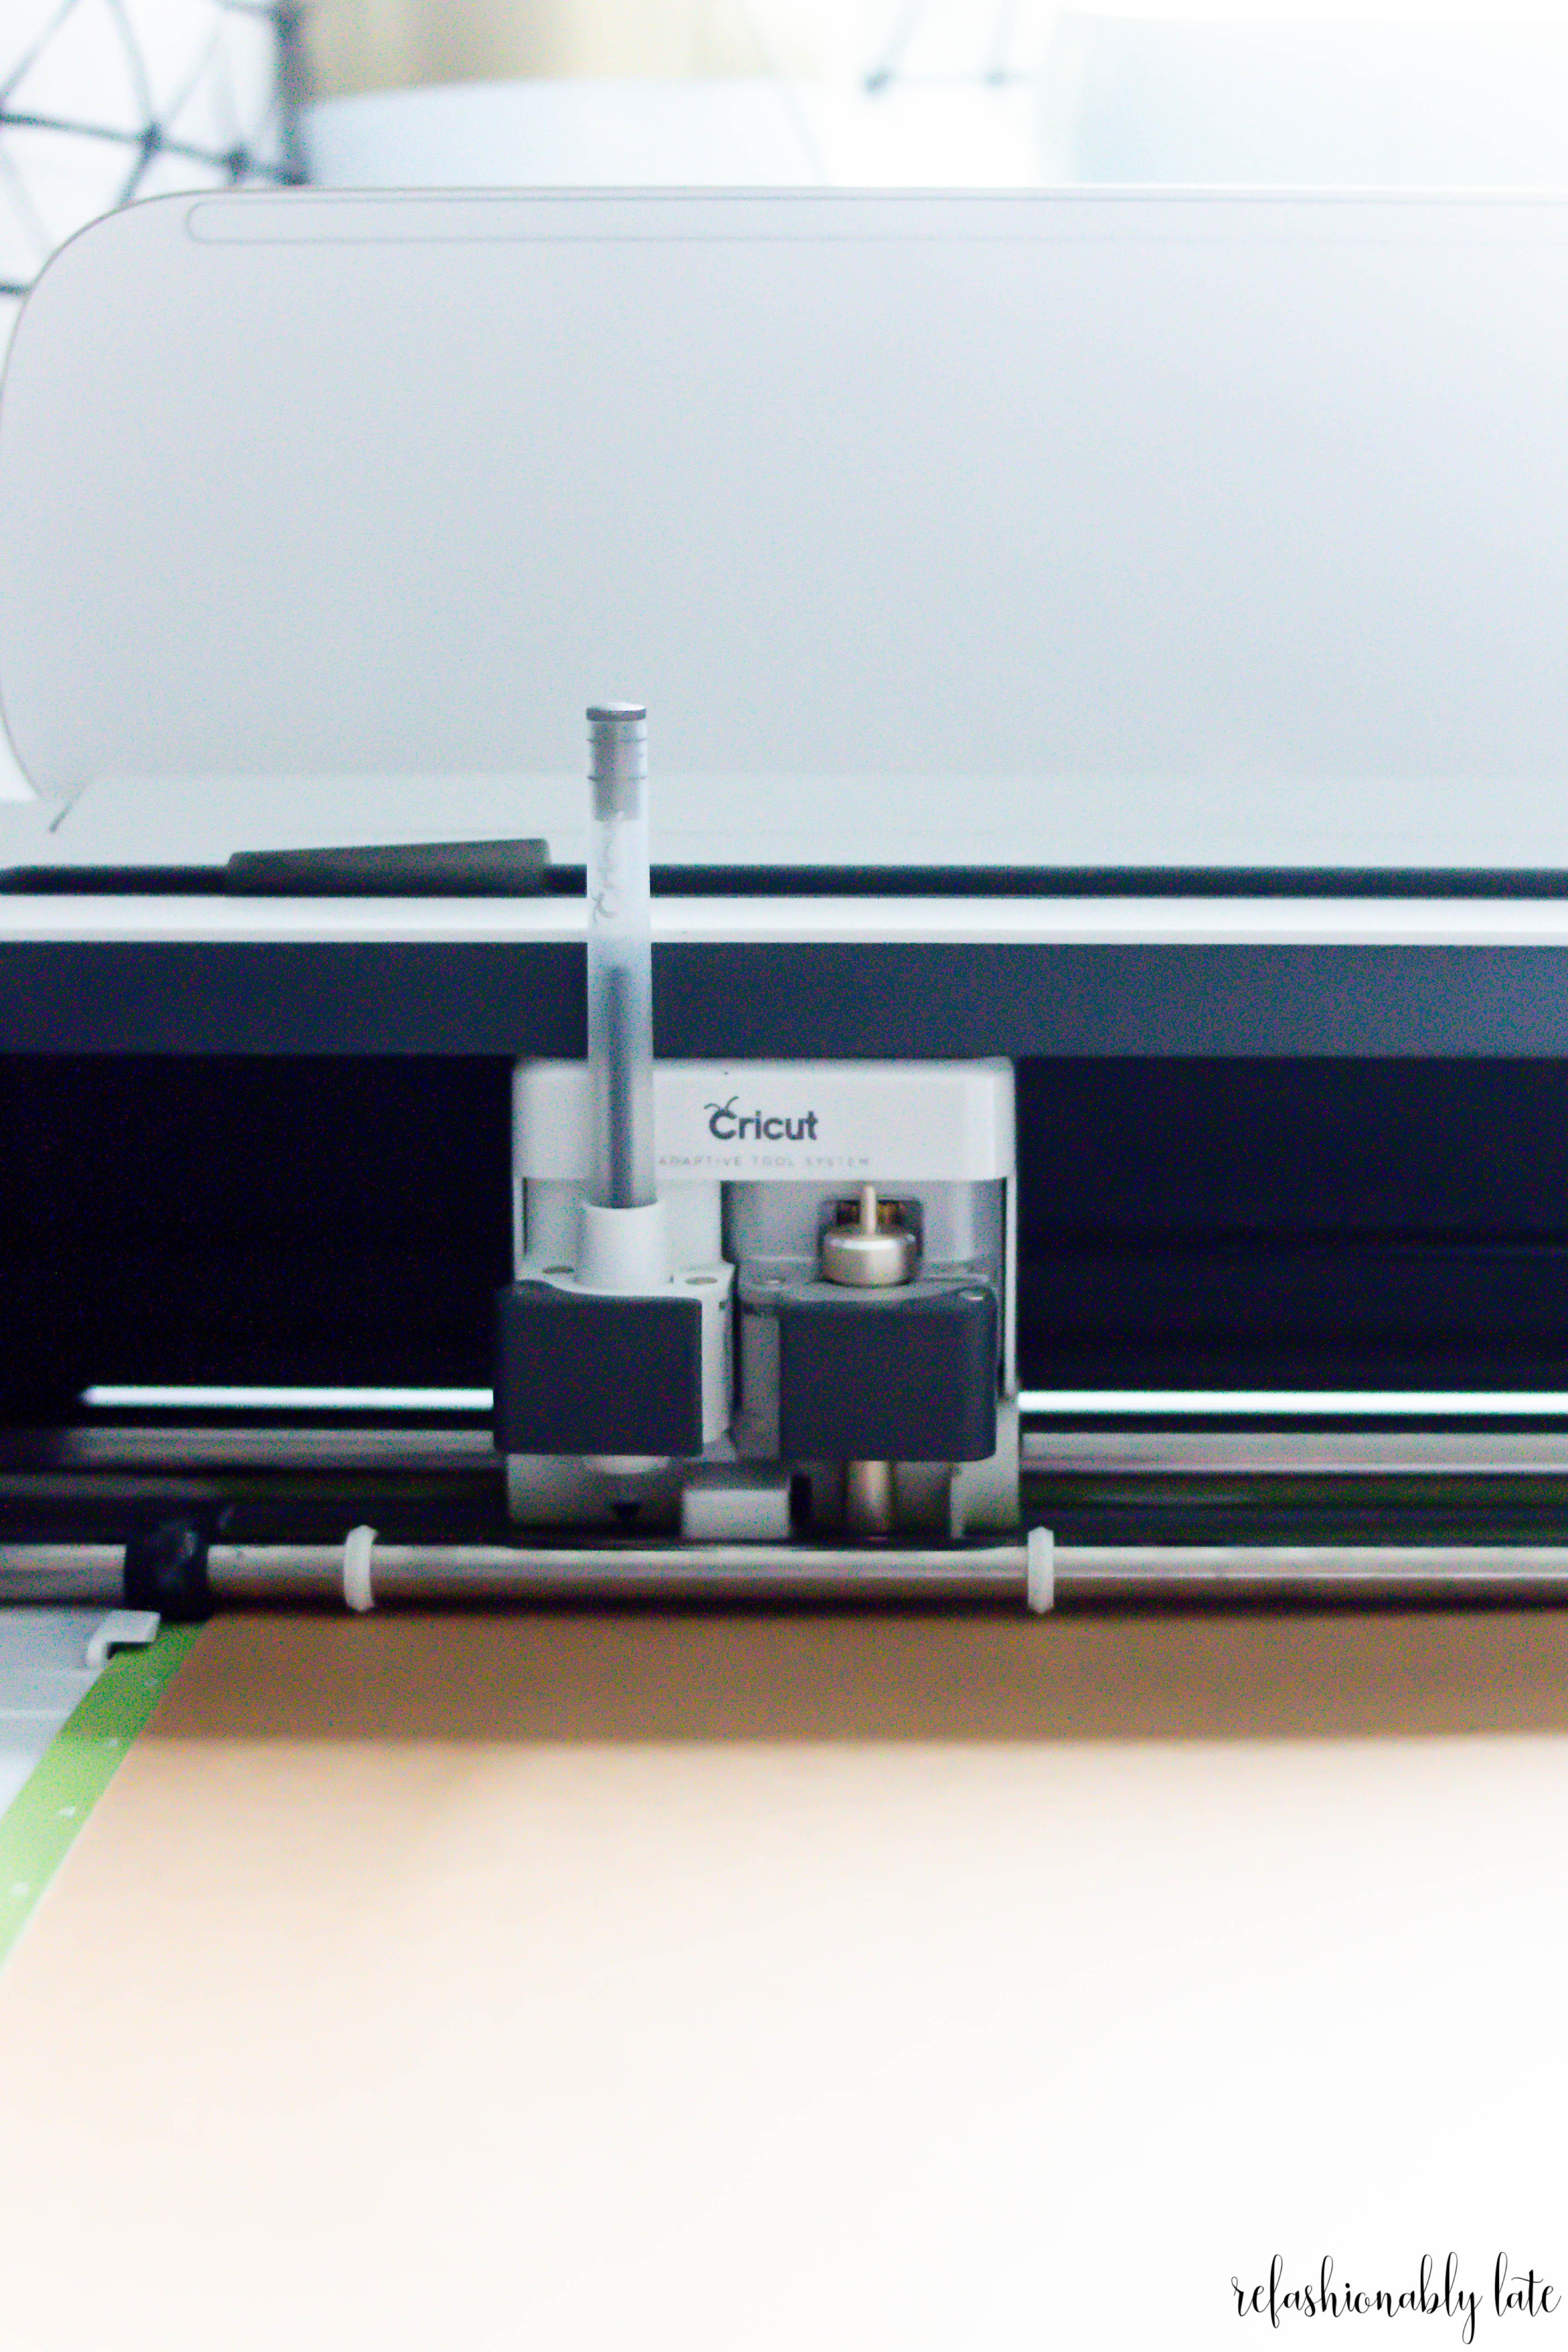 Cricut Maker cutting brown paper with the black glitter gel pen in use